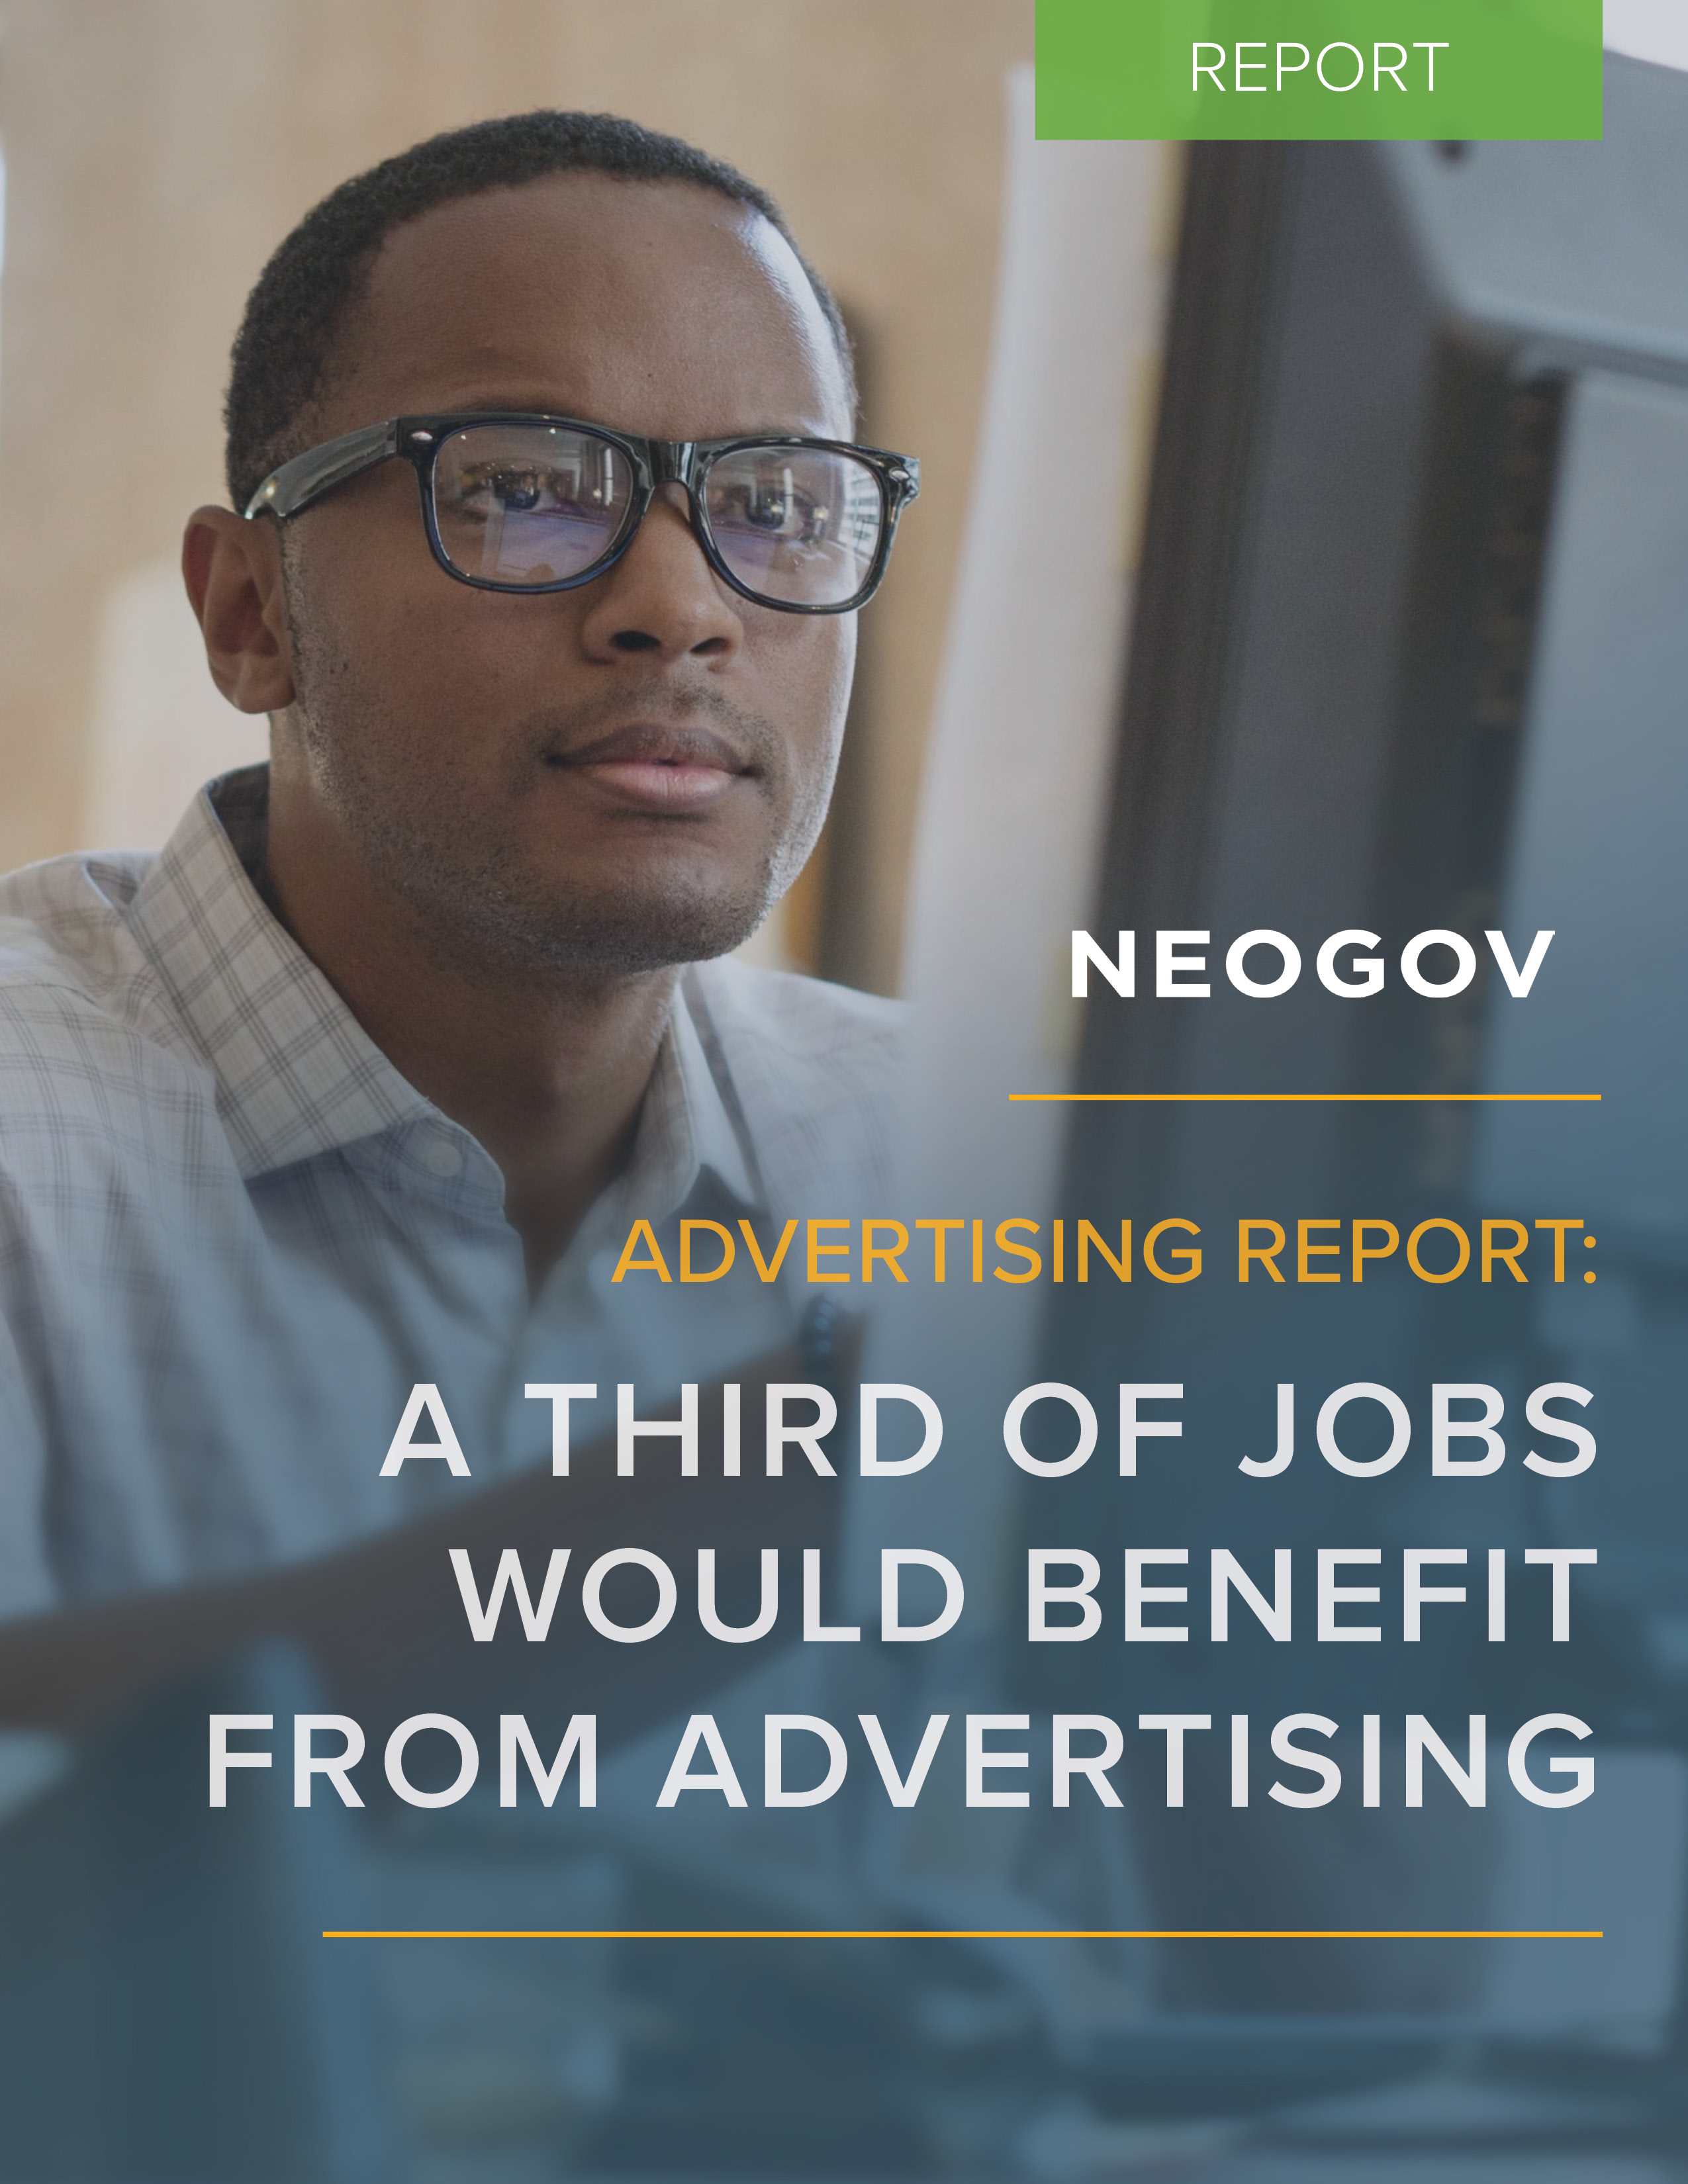 NEOGOV Advertising Report